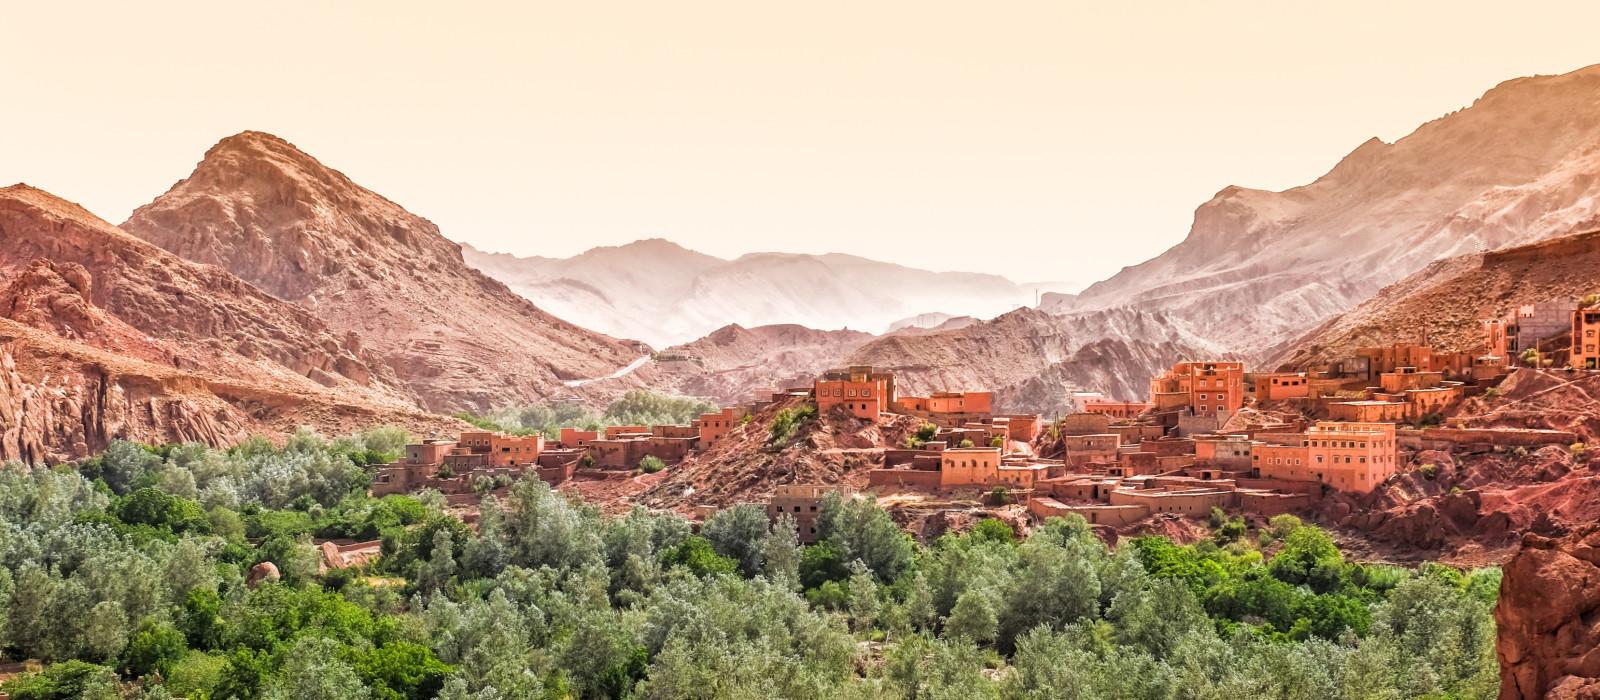 Hotel The Capaldi  Marokko